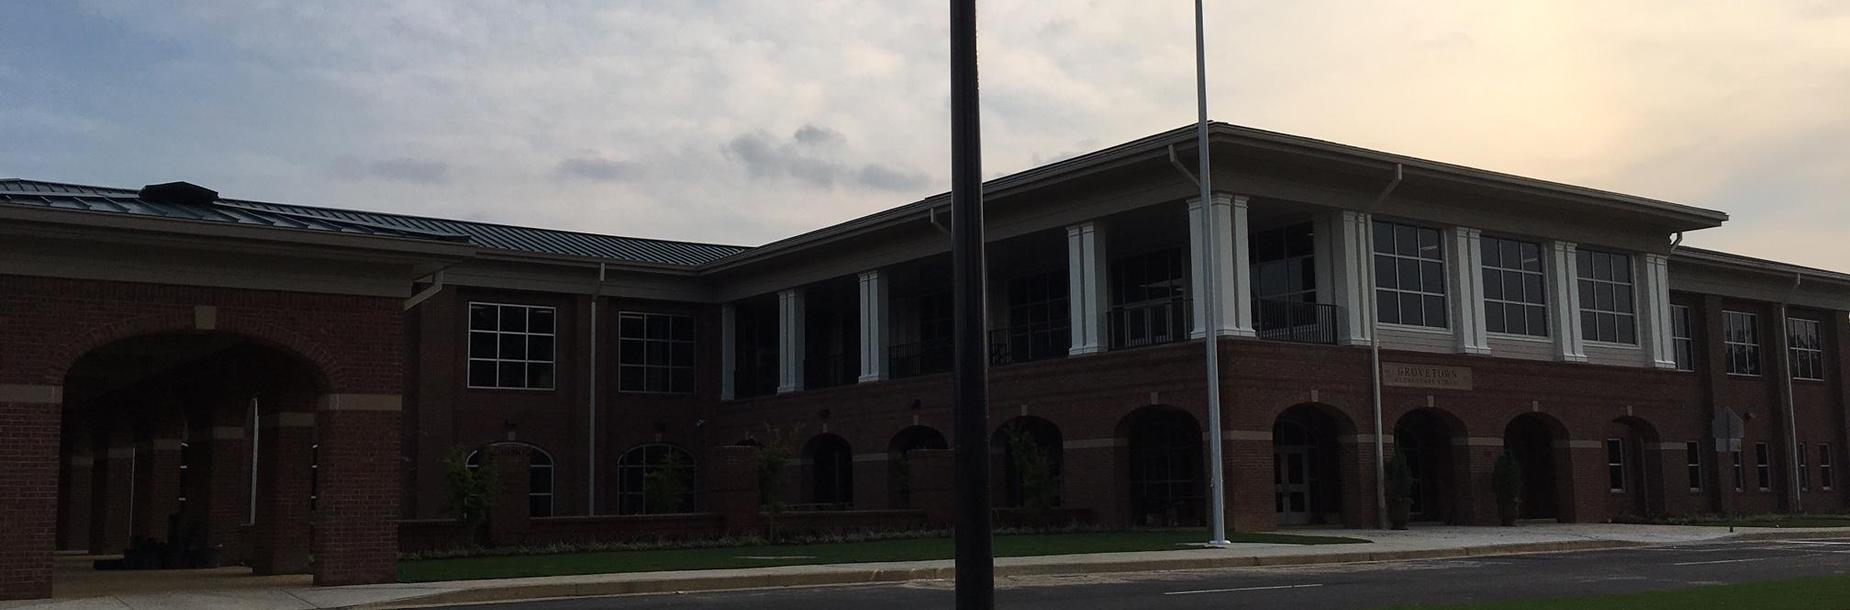 Outside photo of Grovetown Elementary School